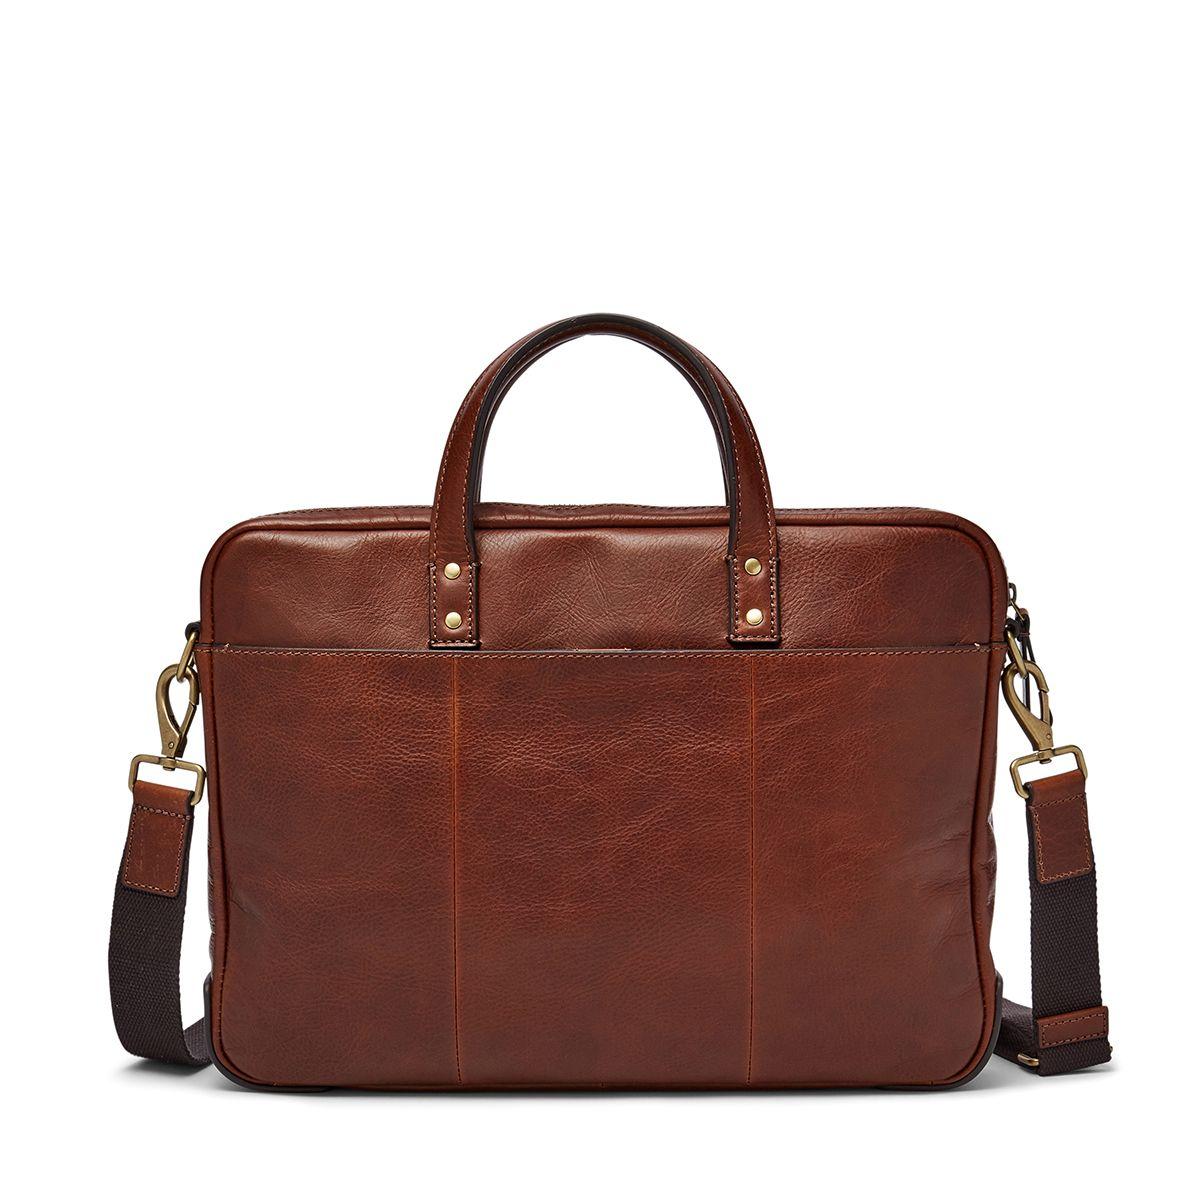 41c3574171 Fossil Handbags   Purses - Macy s